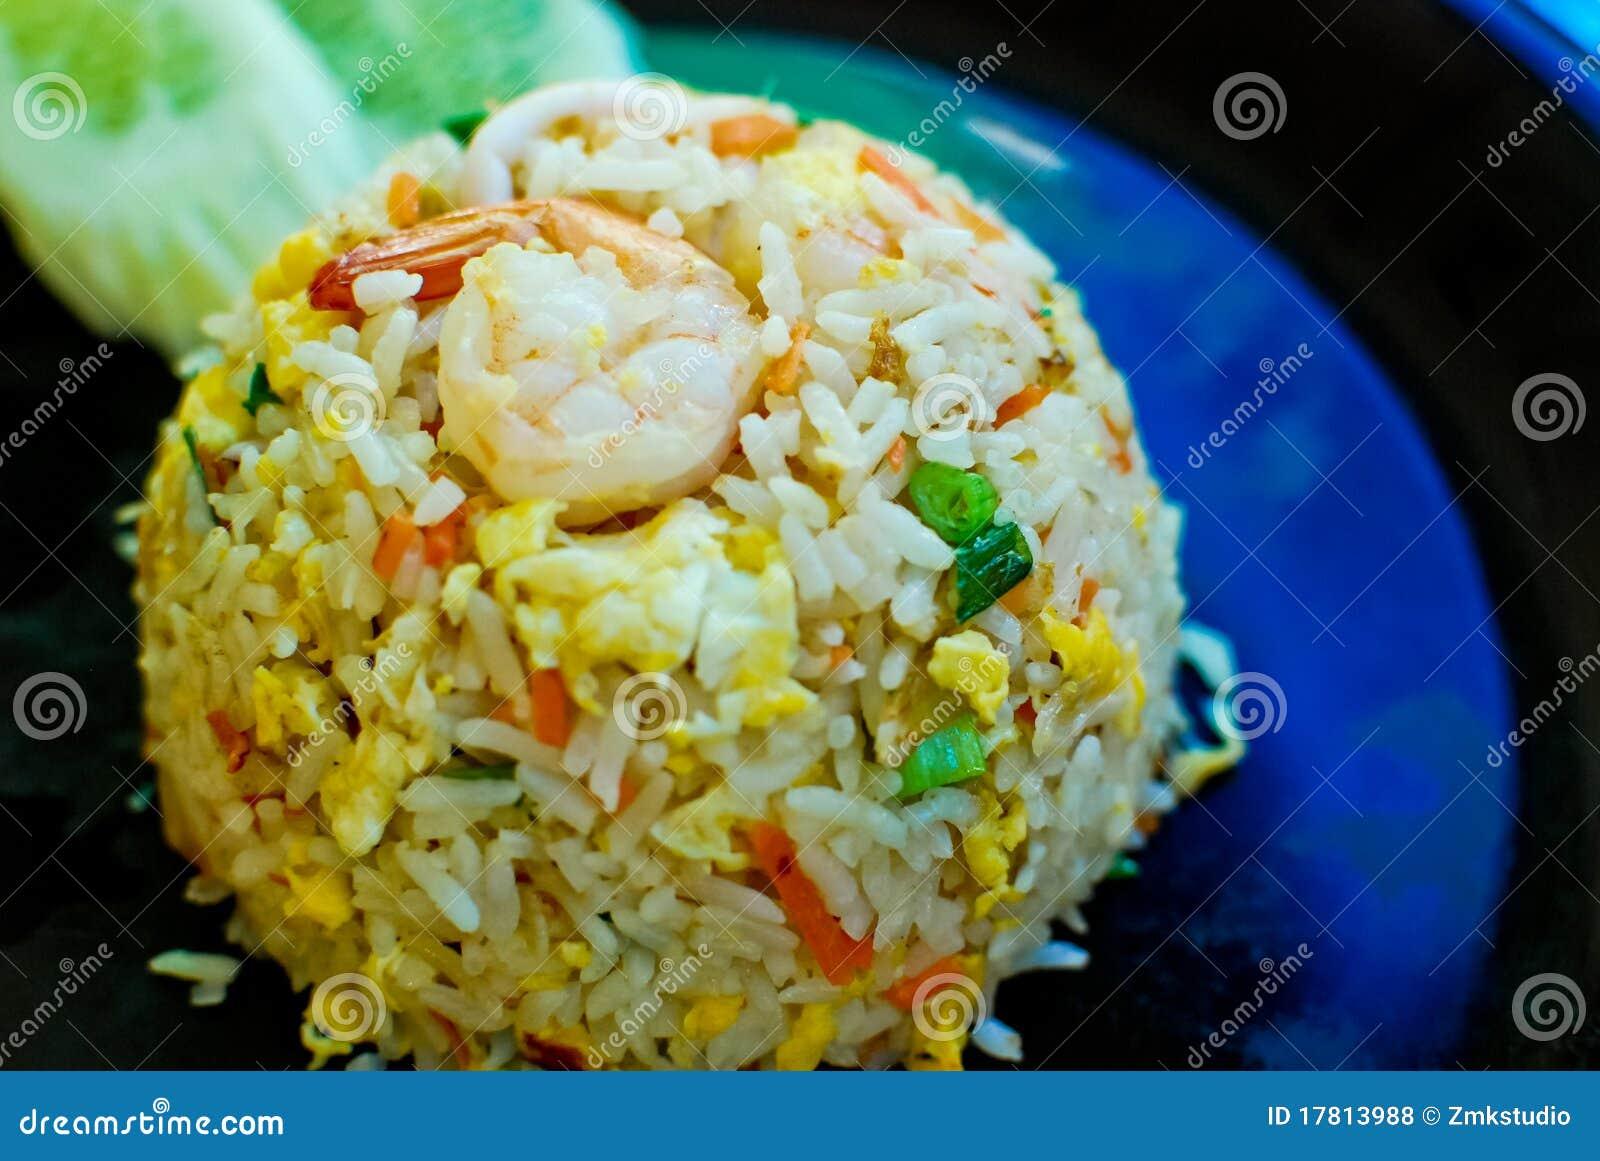 Thai Style Fried Rice Royalty Free Stock Photos - Image: 17813988